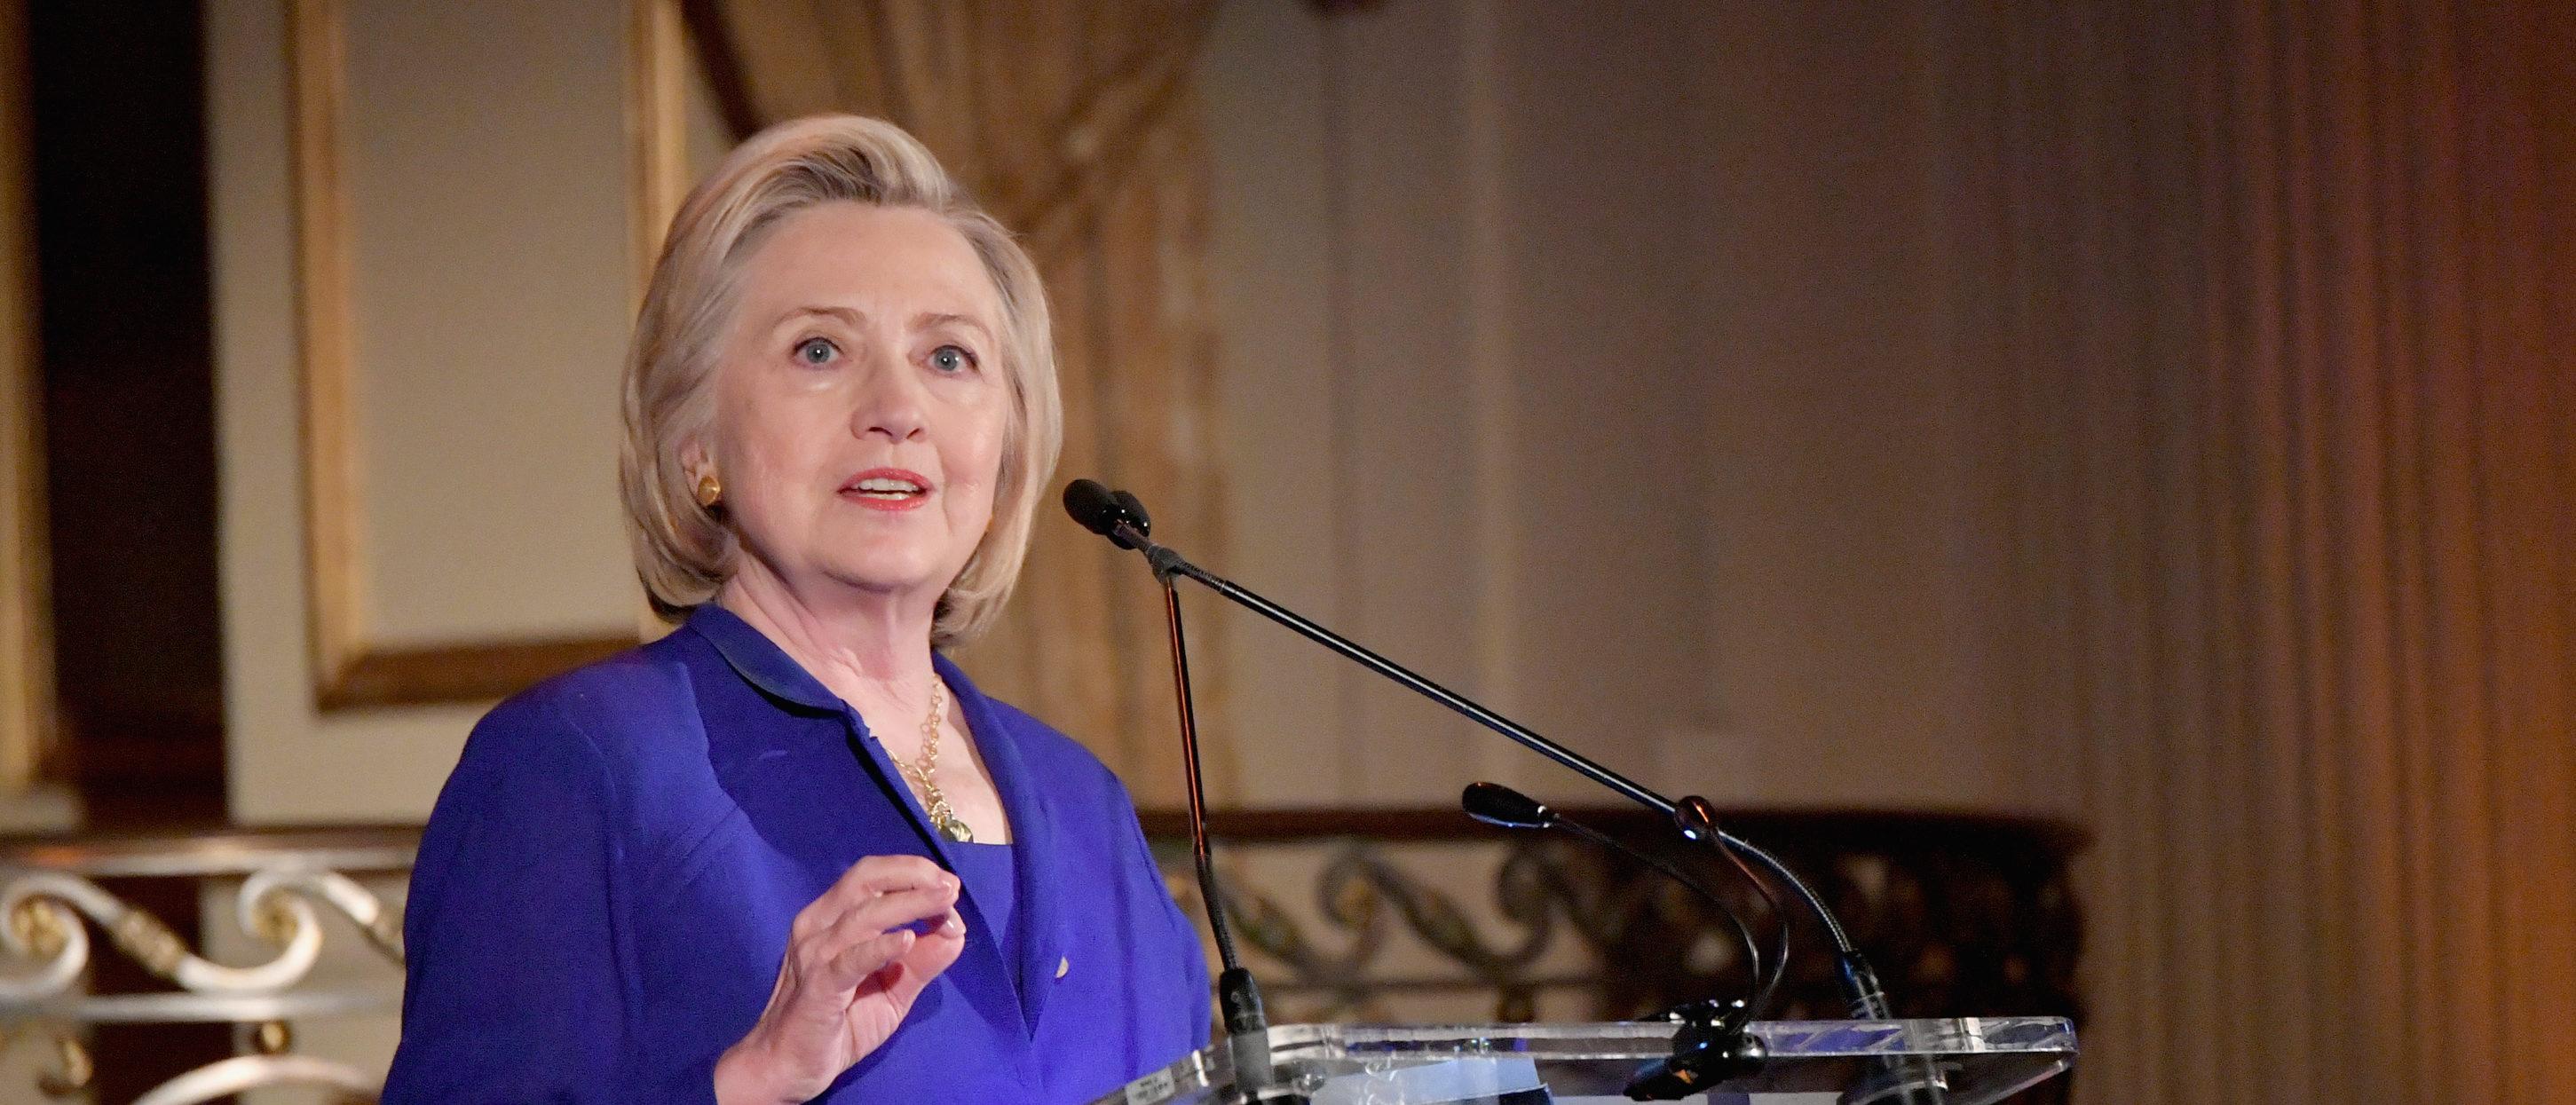 2020? — Hillary Clinton To Appear At Teachers Union Conference Where Bernie Sanders, Elizabeth Warren Also Speaking